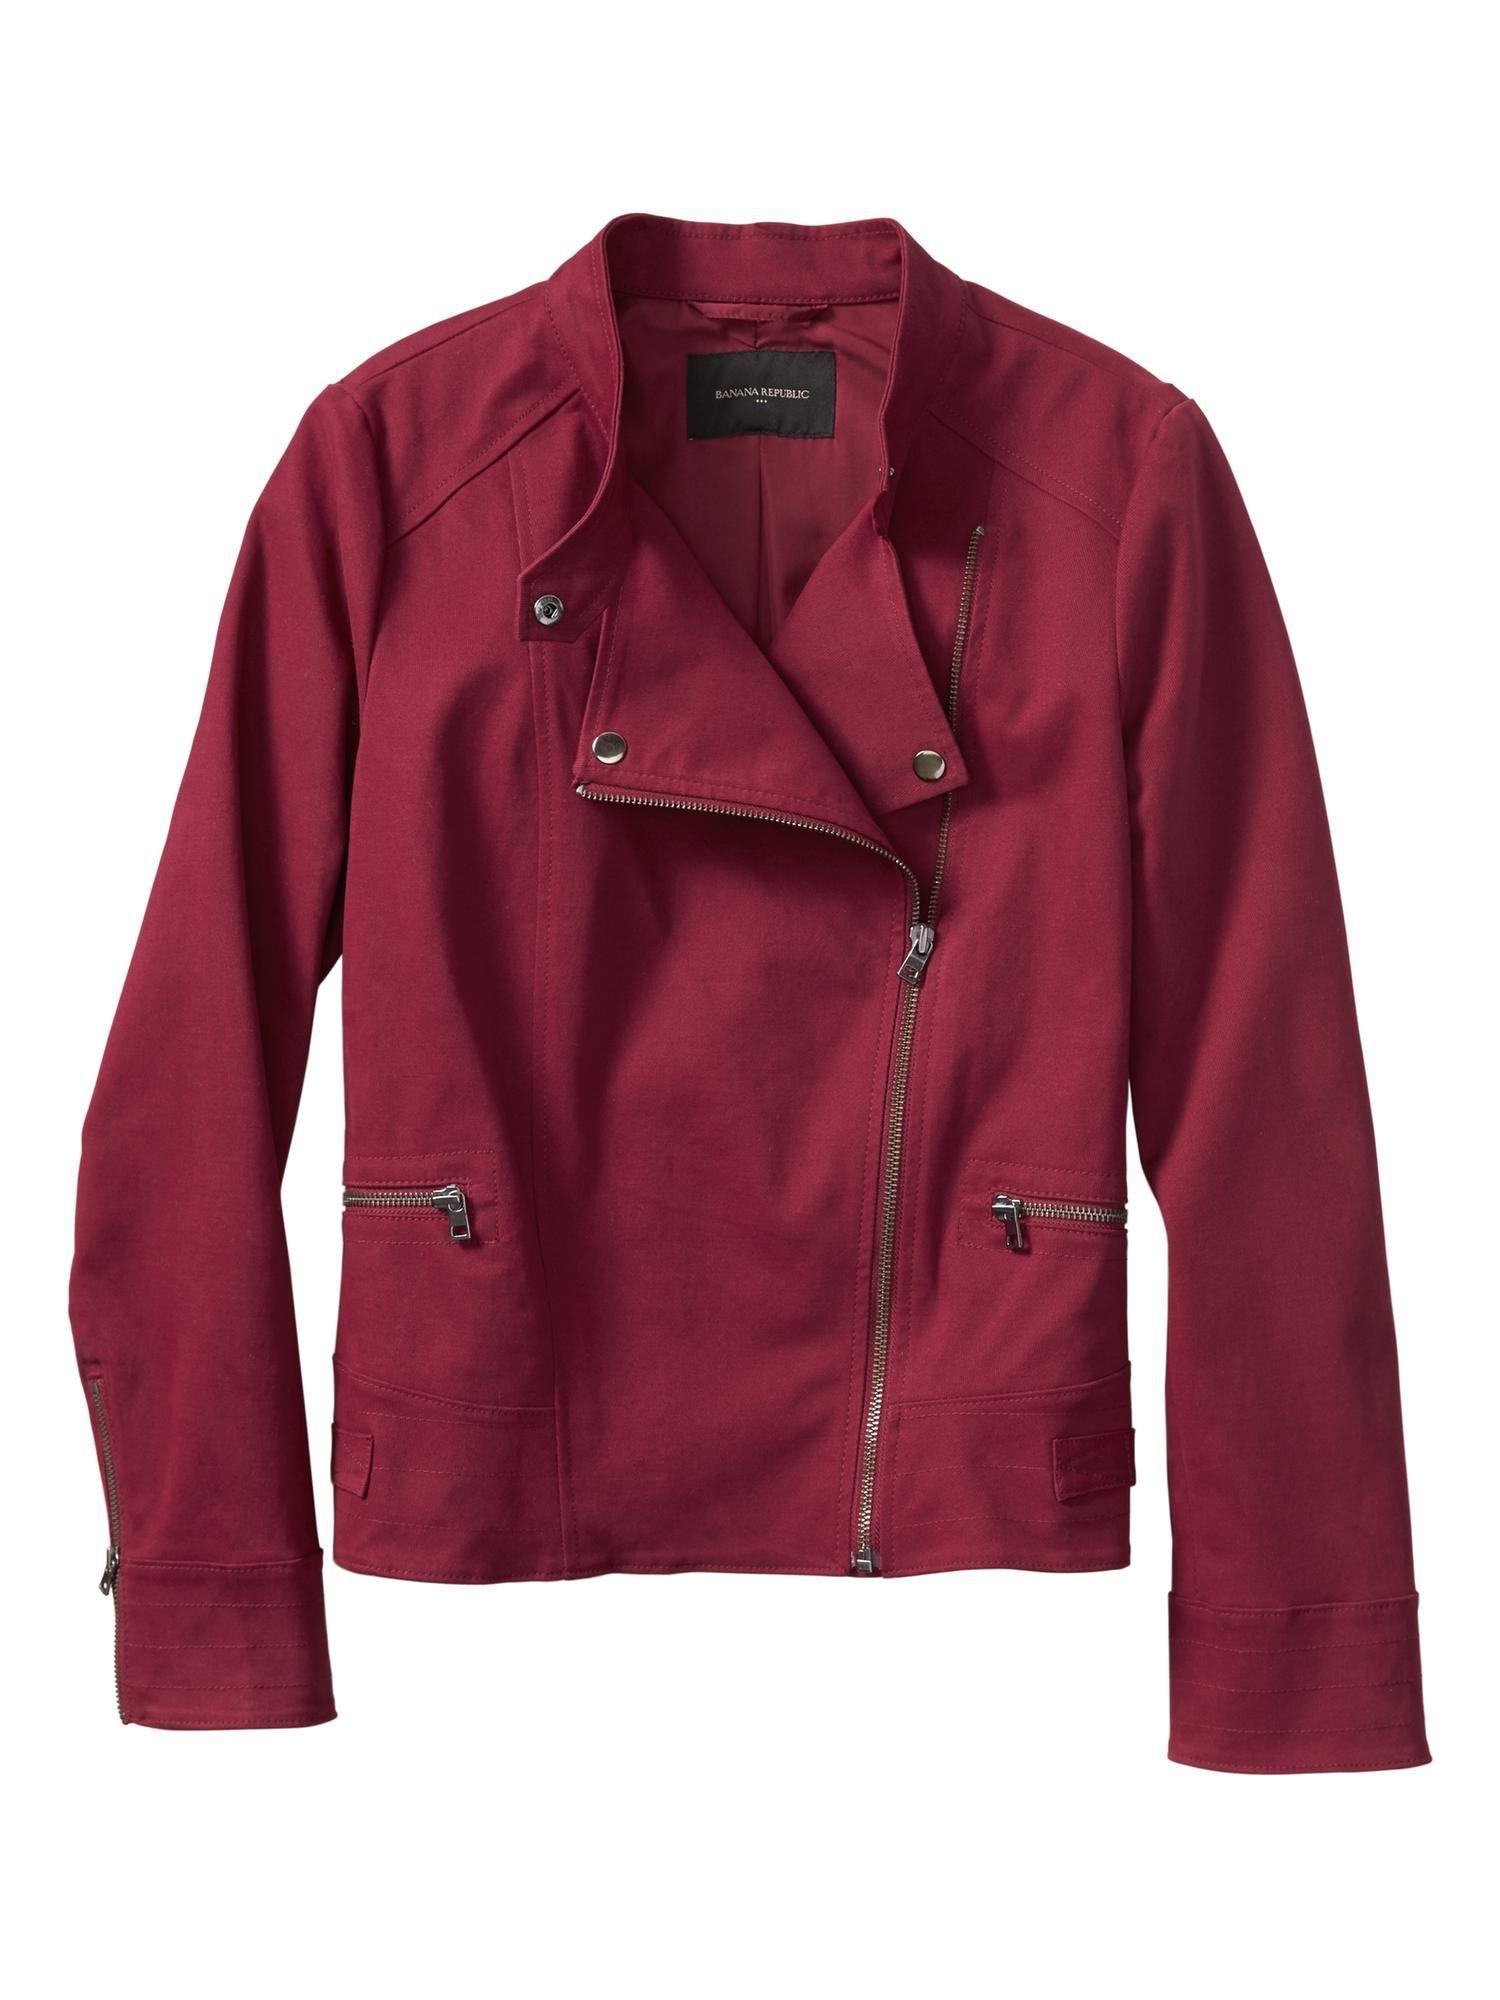 Moto Jacket.Interesting color. Colorful shirts